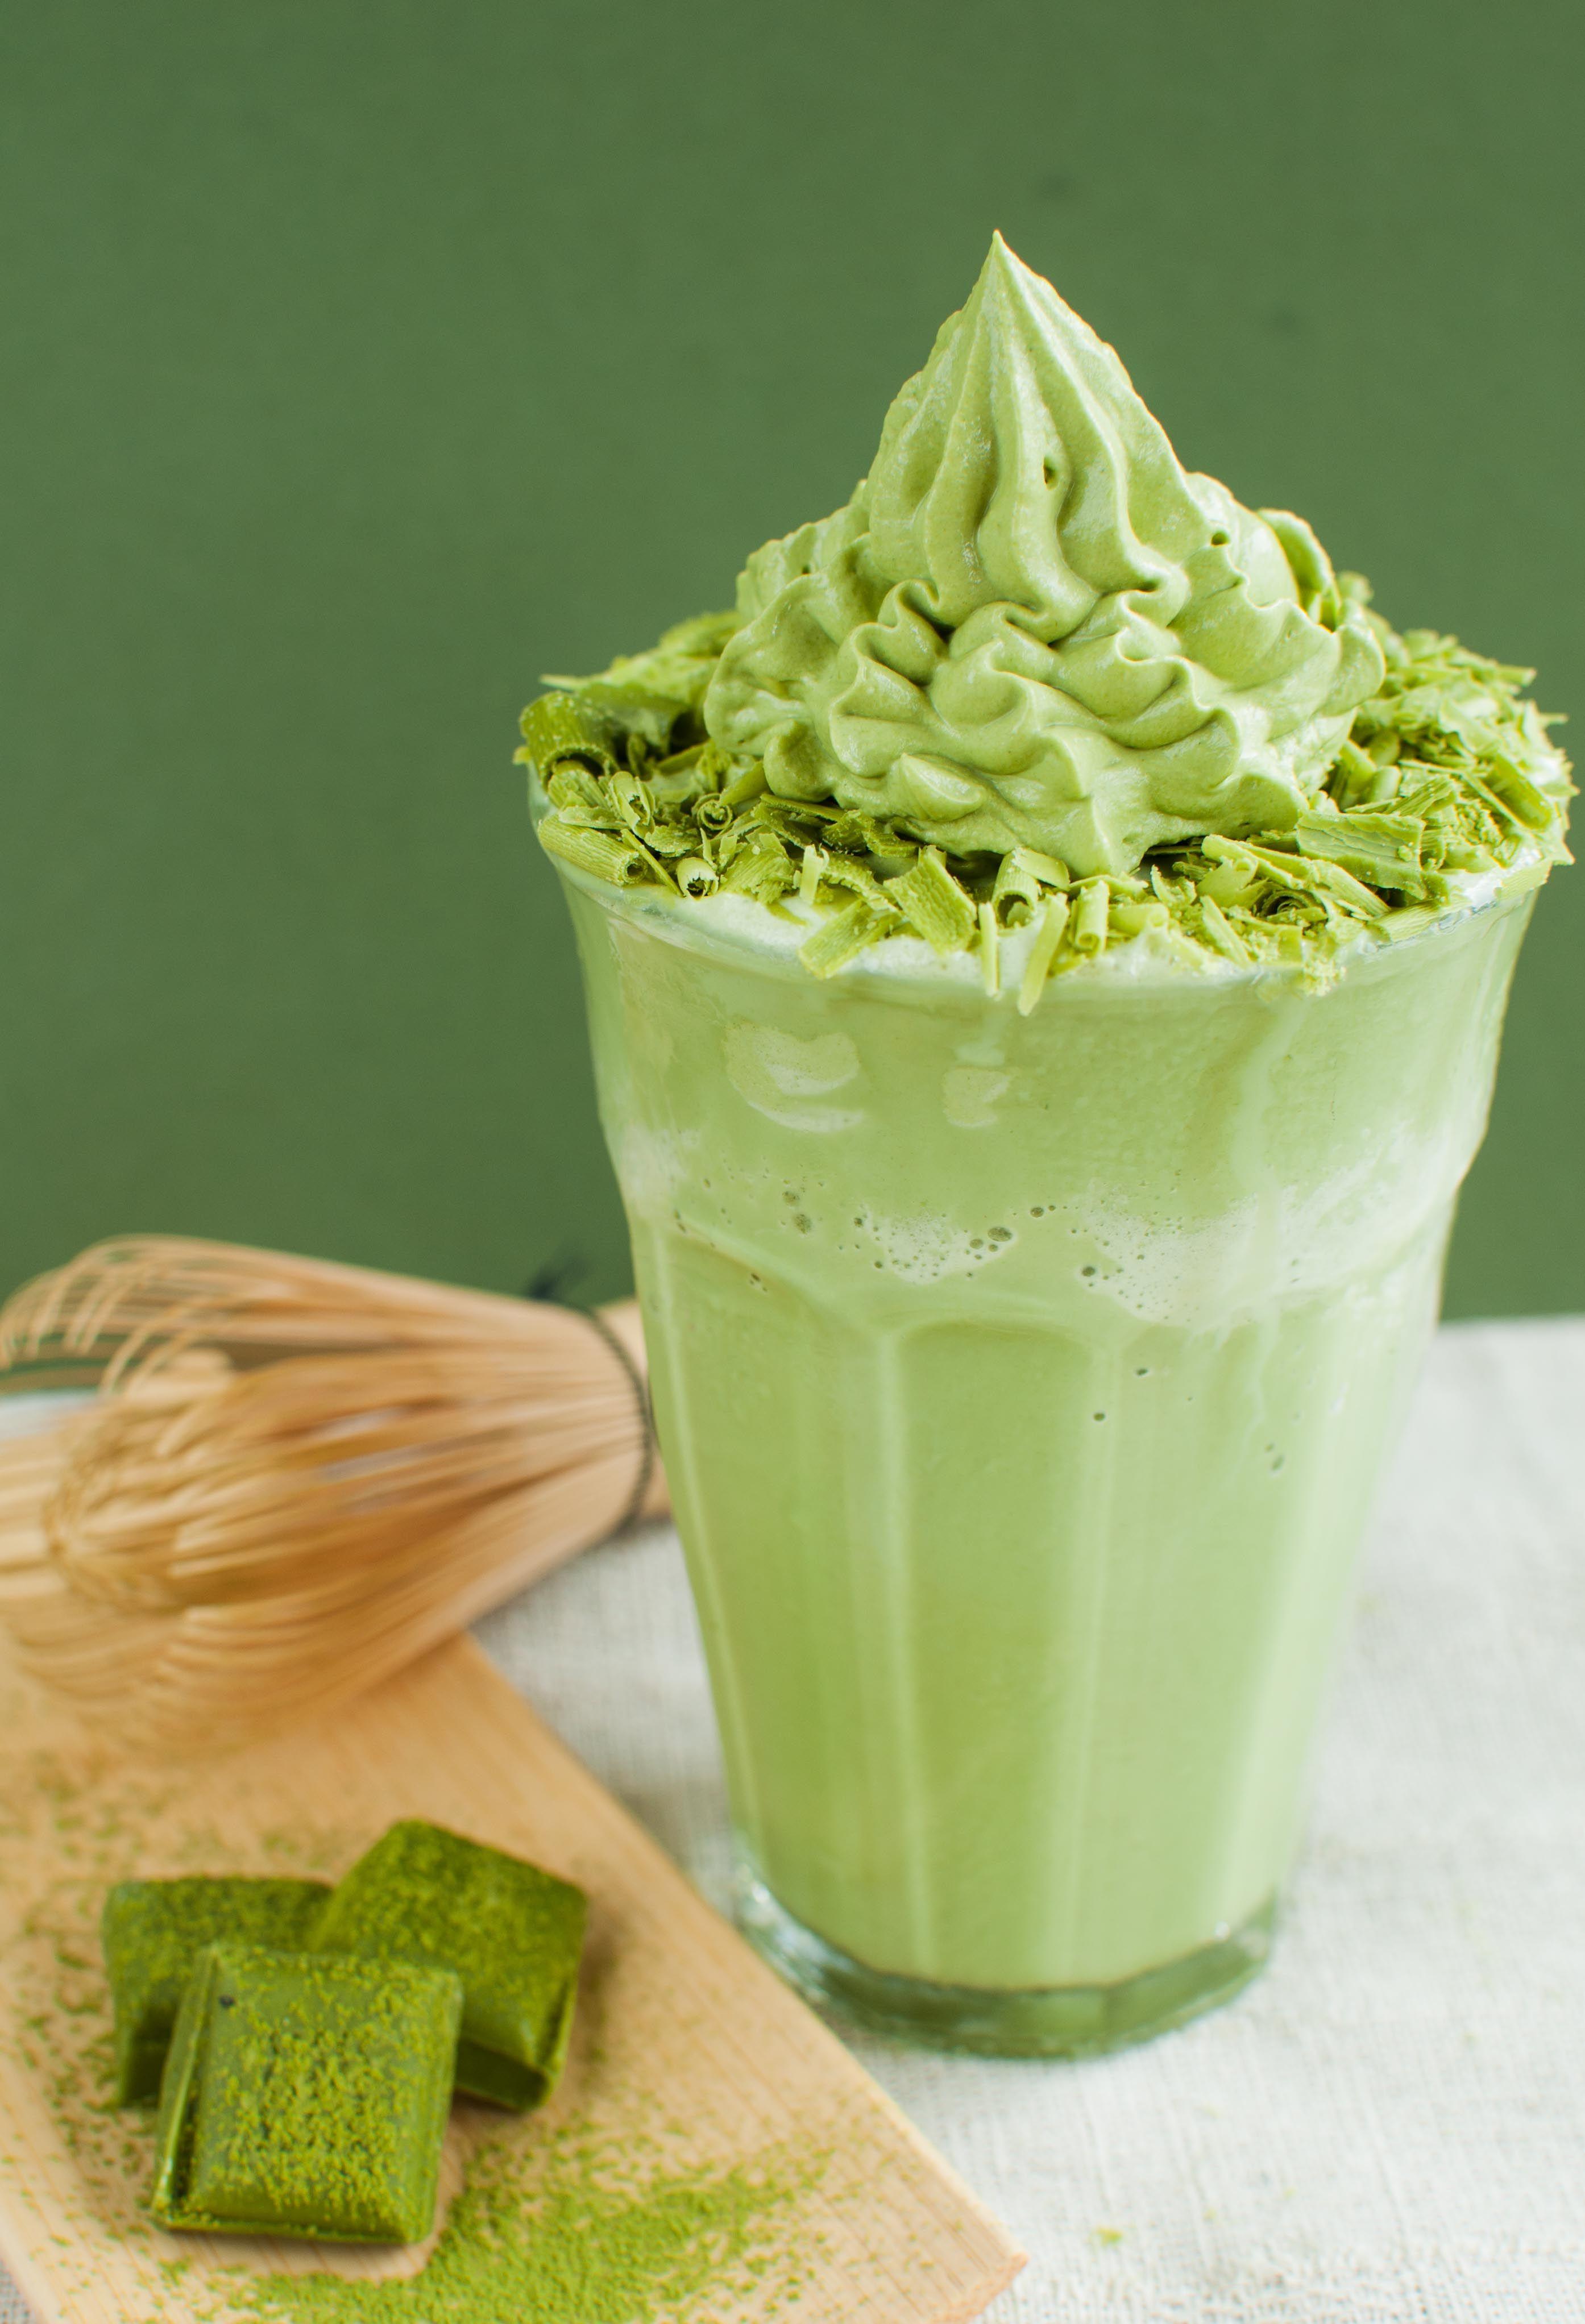 Deluxe Matcha Shake #matcha #shake #dessert #sweet #drink #mof # ...